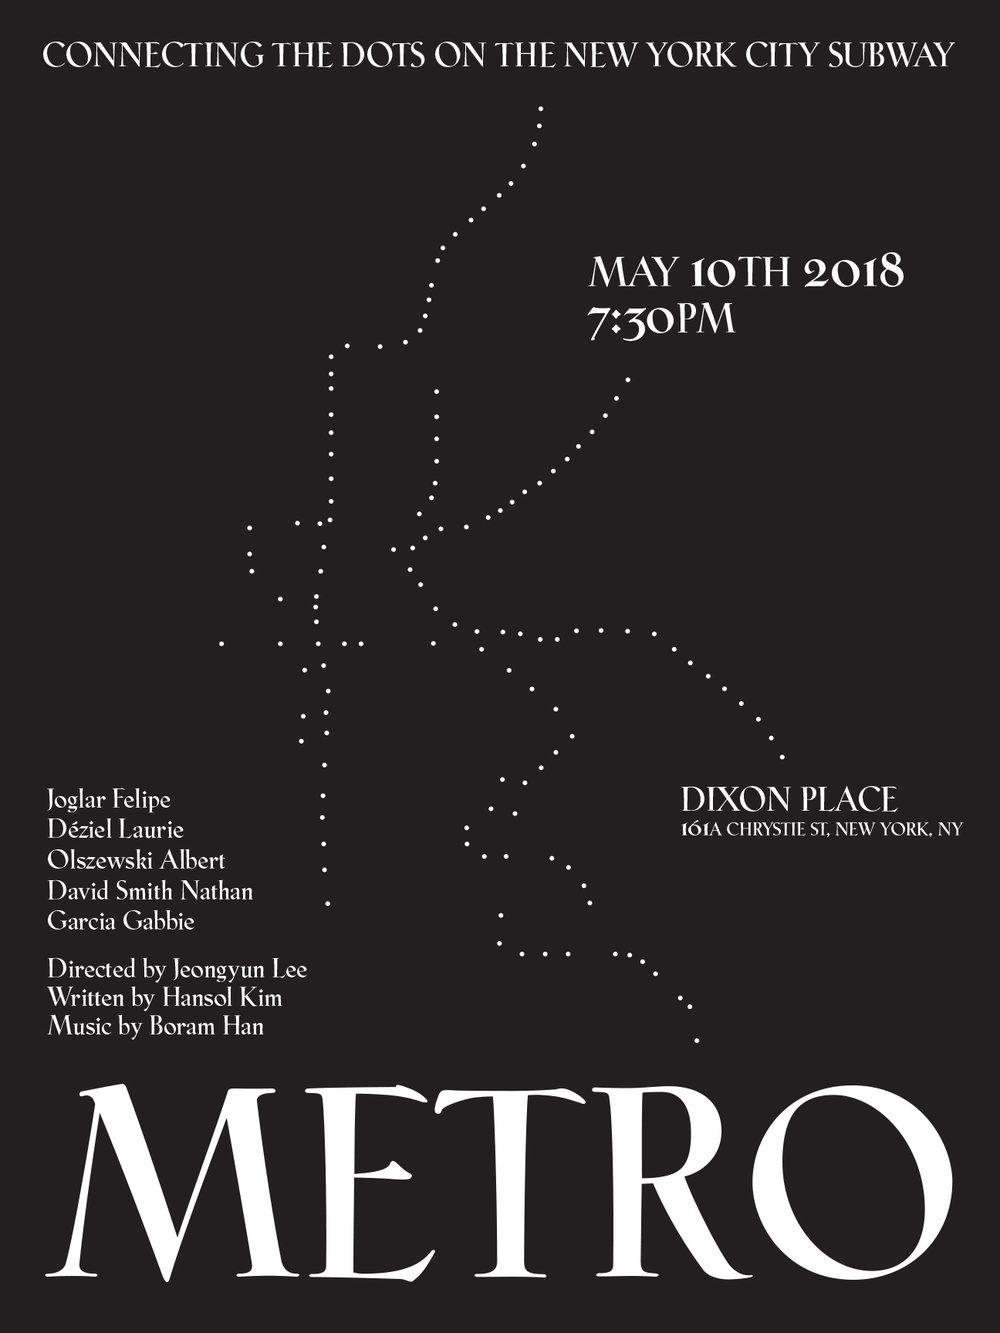 metro-new.jpg